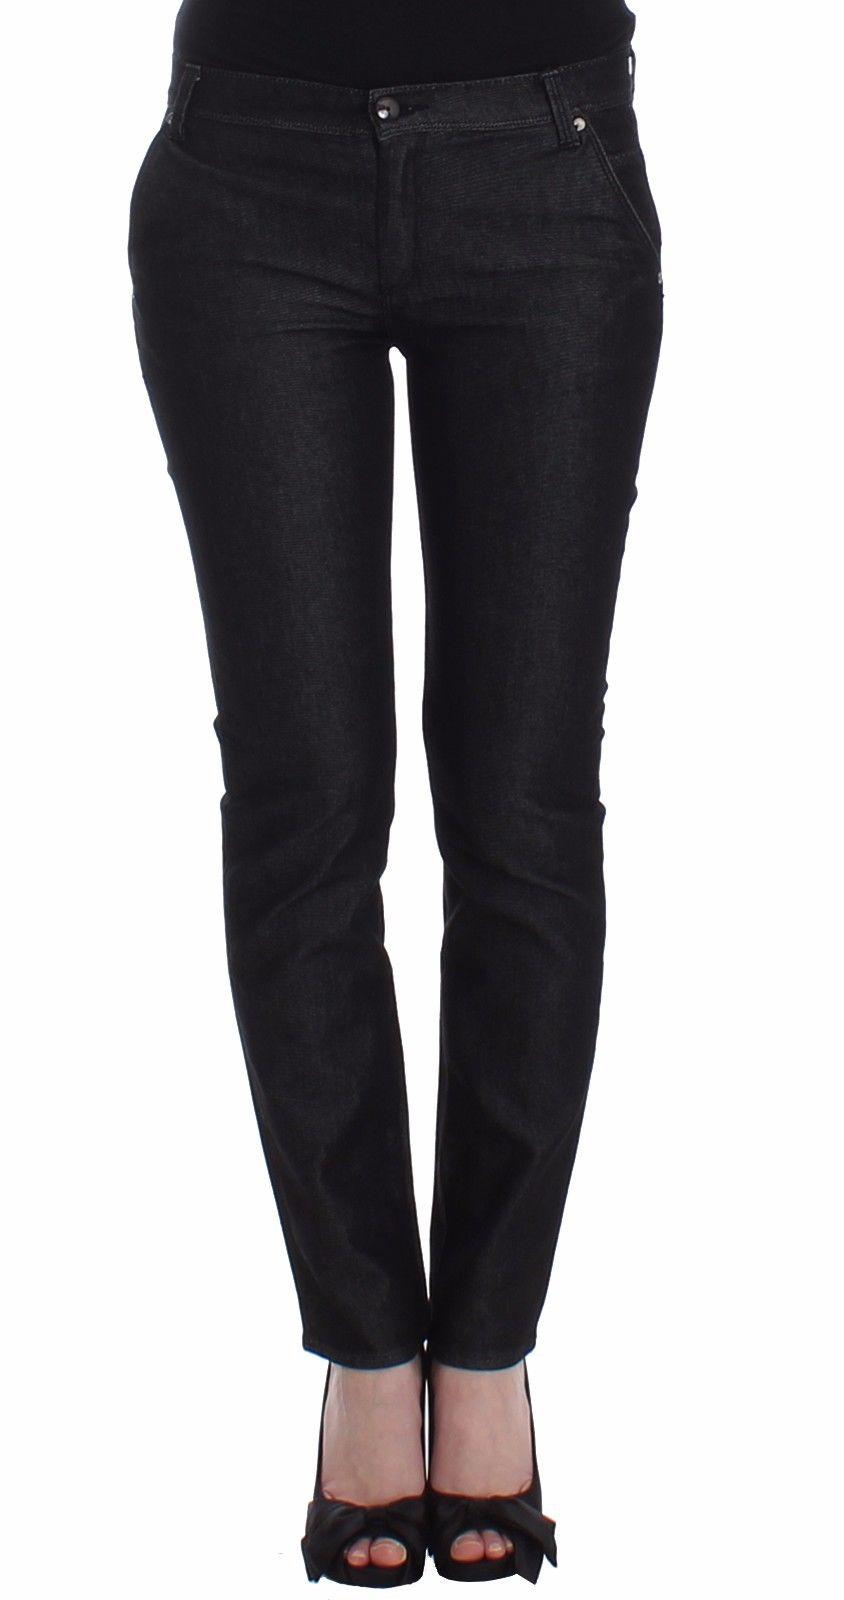 Ermanno Scervino Women's Slim Fit Jeans Black SIG12451 - W26